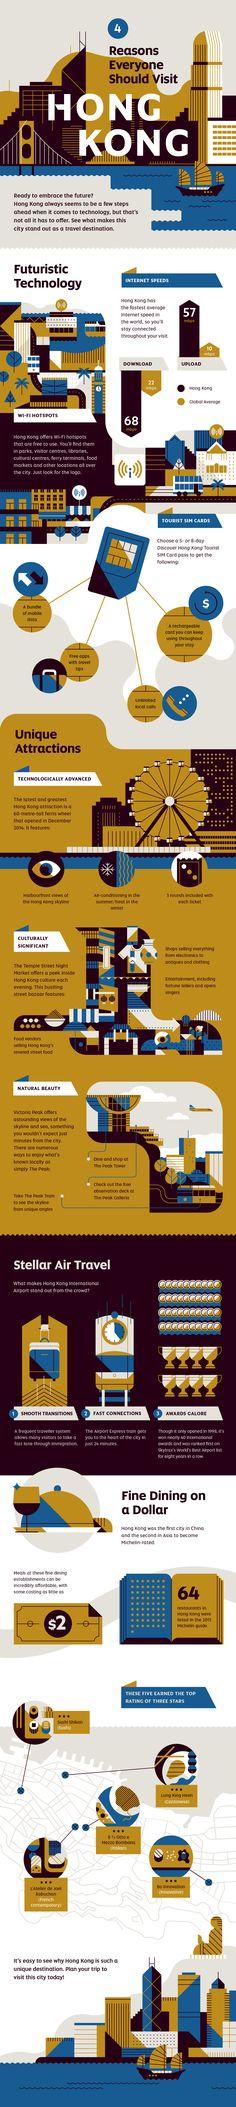 Infographic and illustrations for Etihad – 4 reasons why everyone should visit Hong Kong.